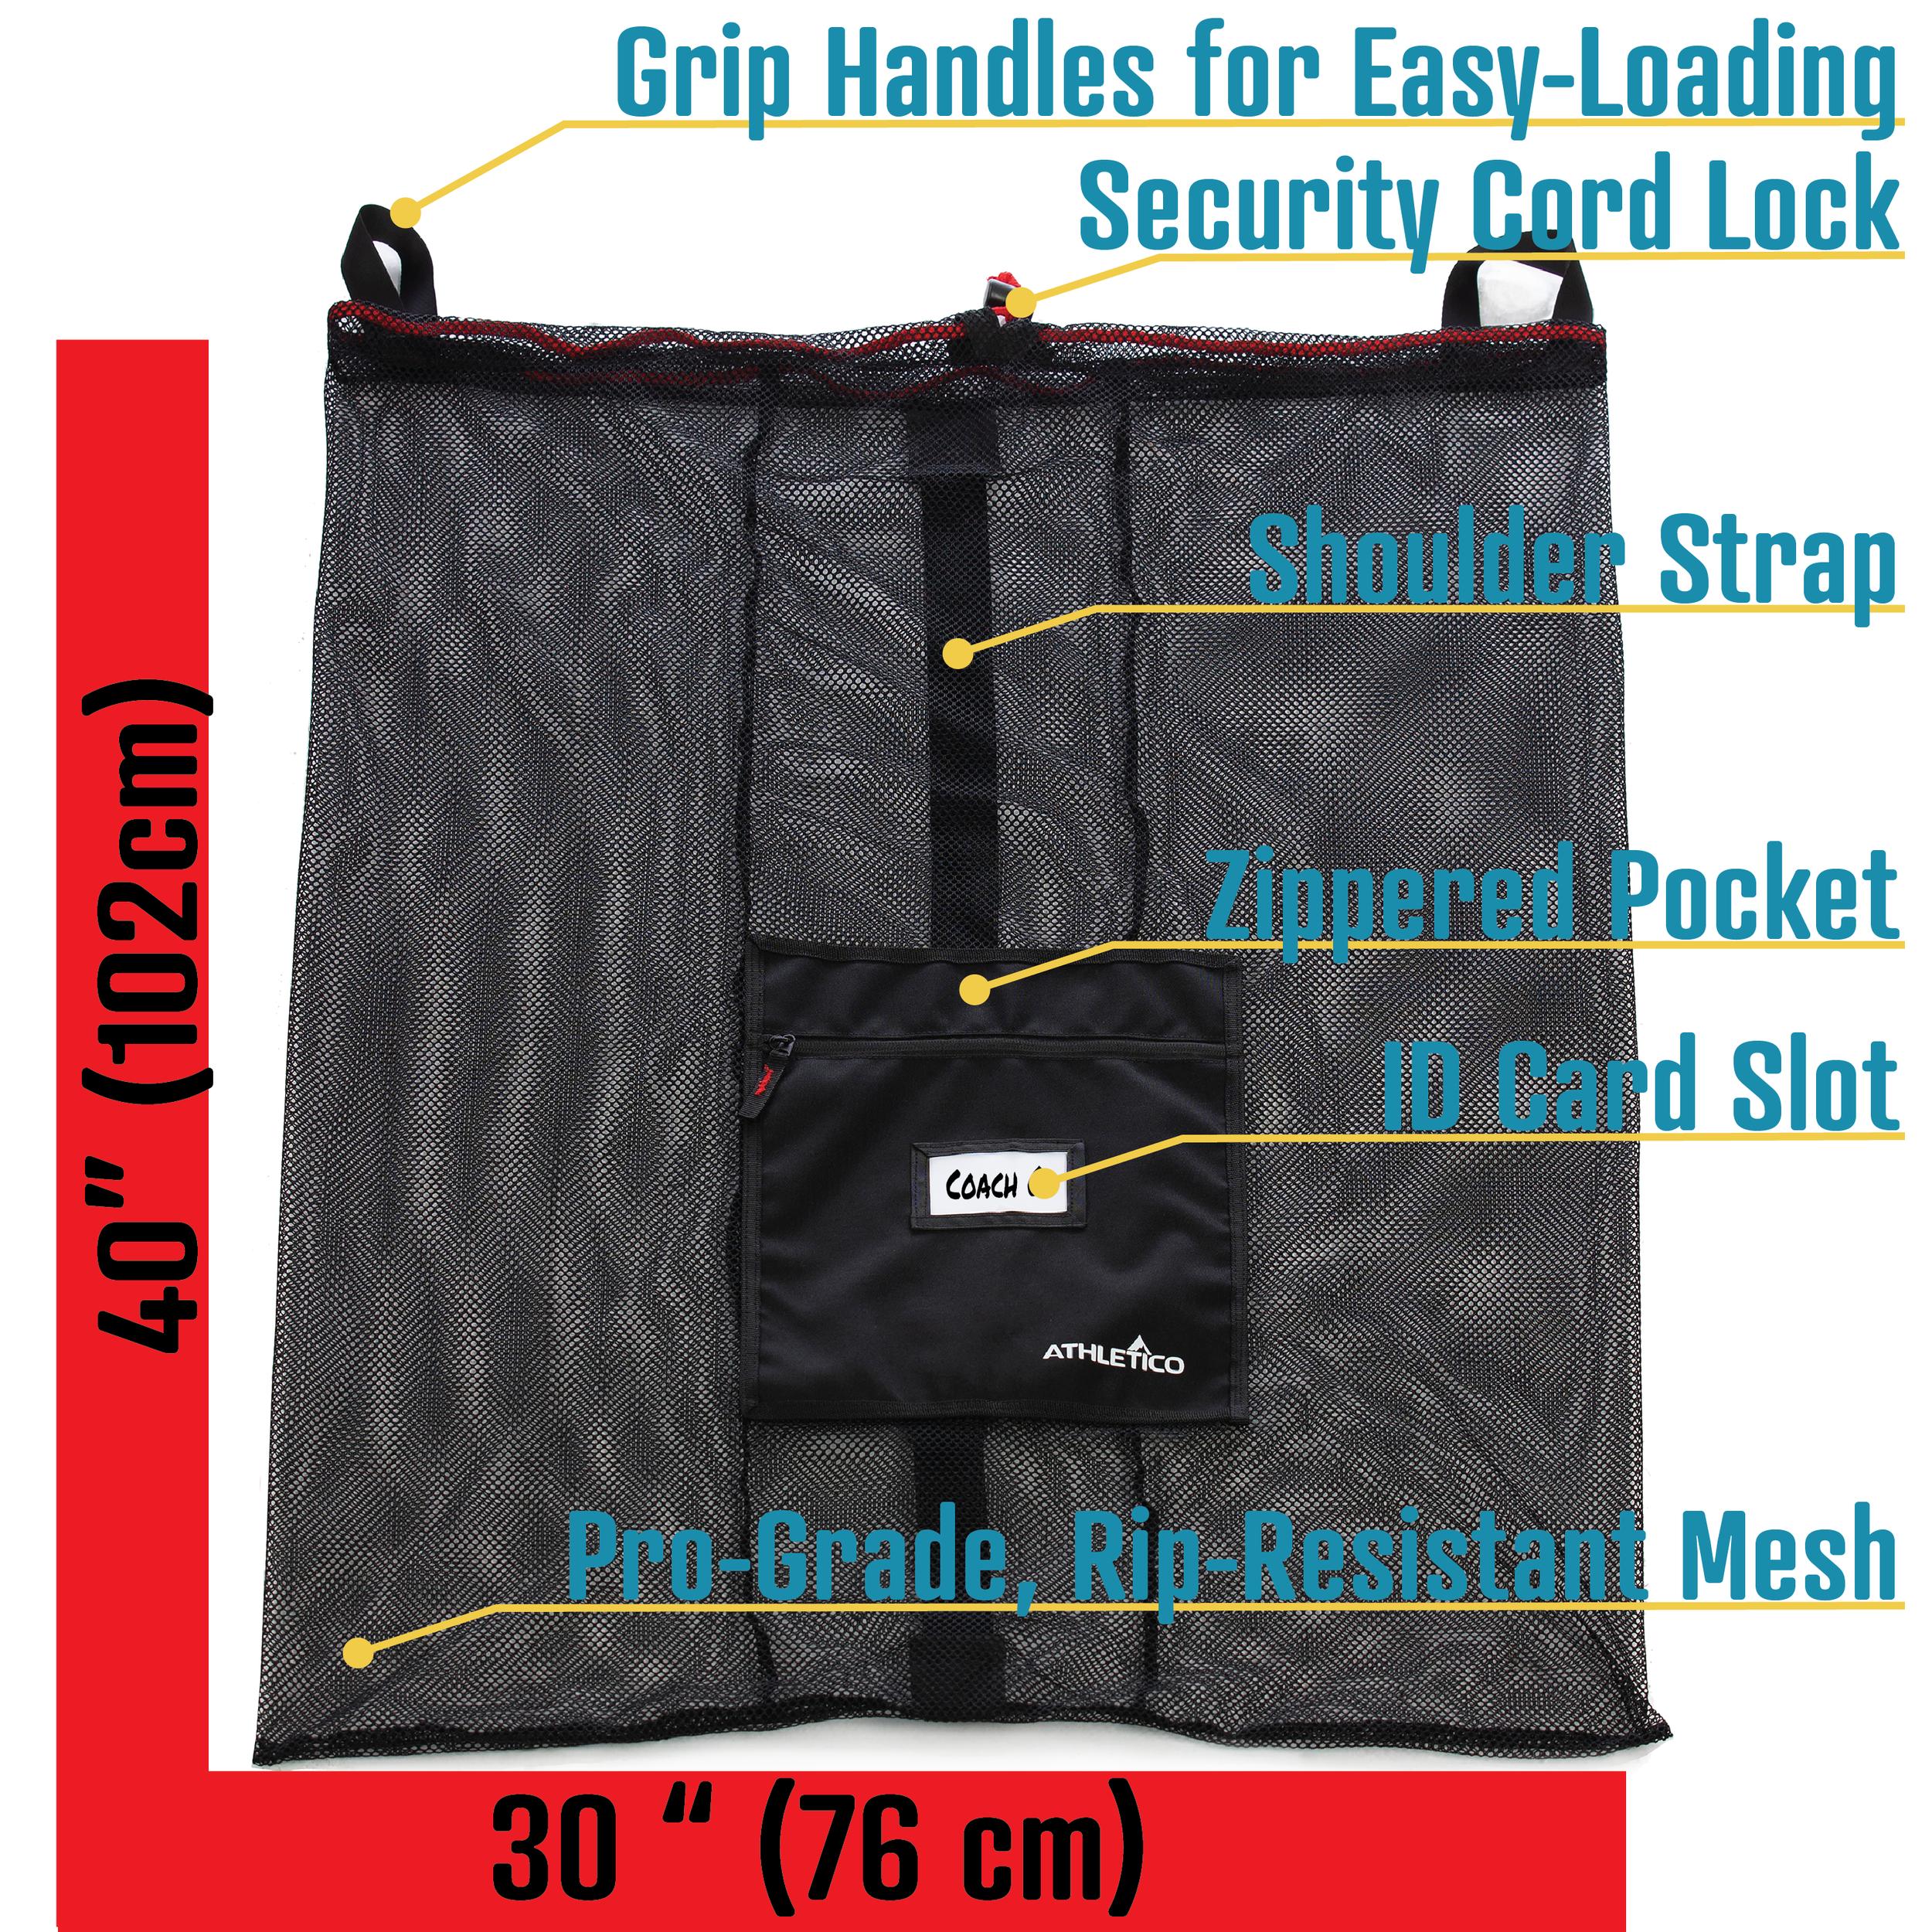 Mesh Bag Listing2.png